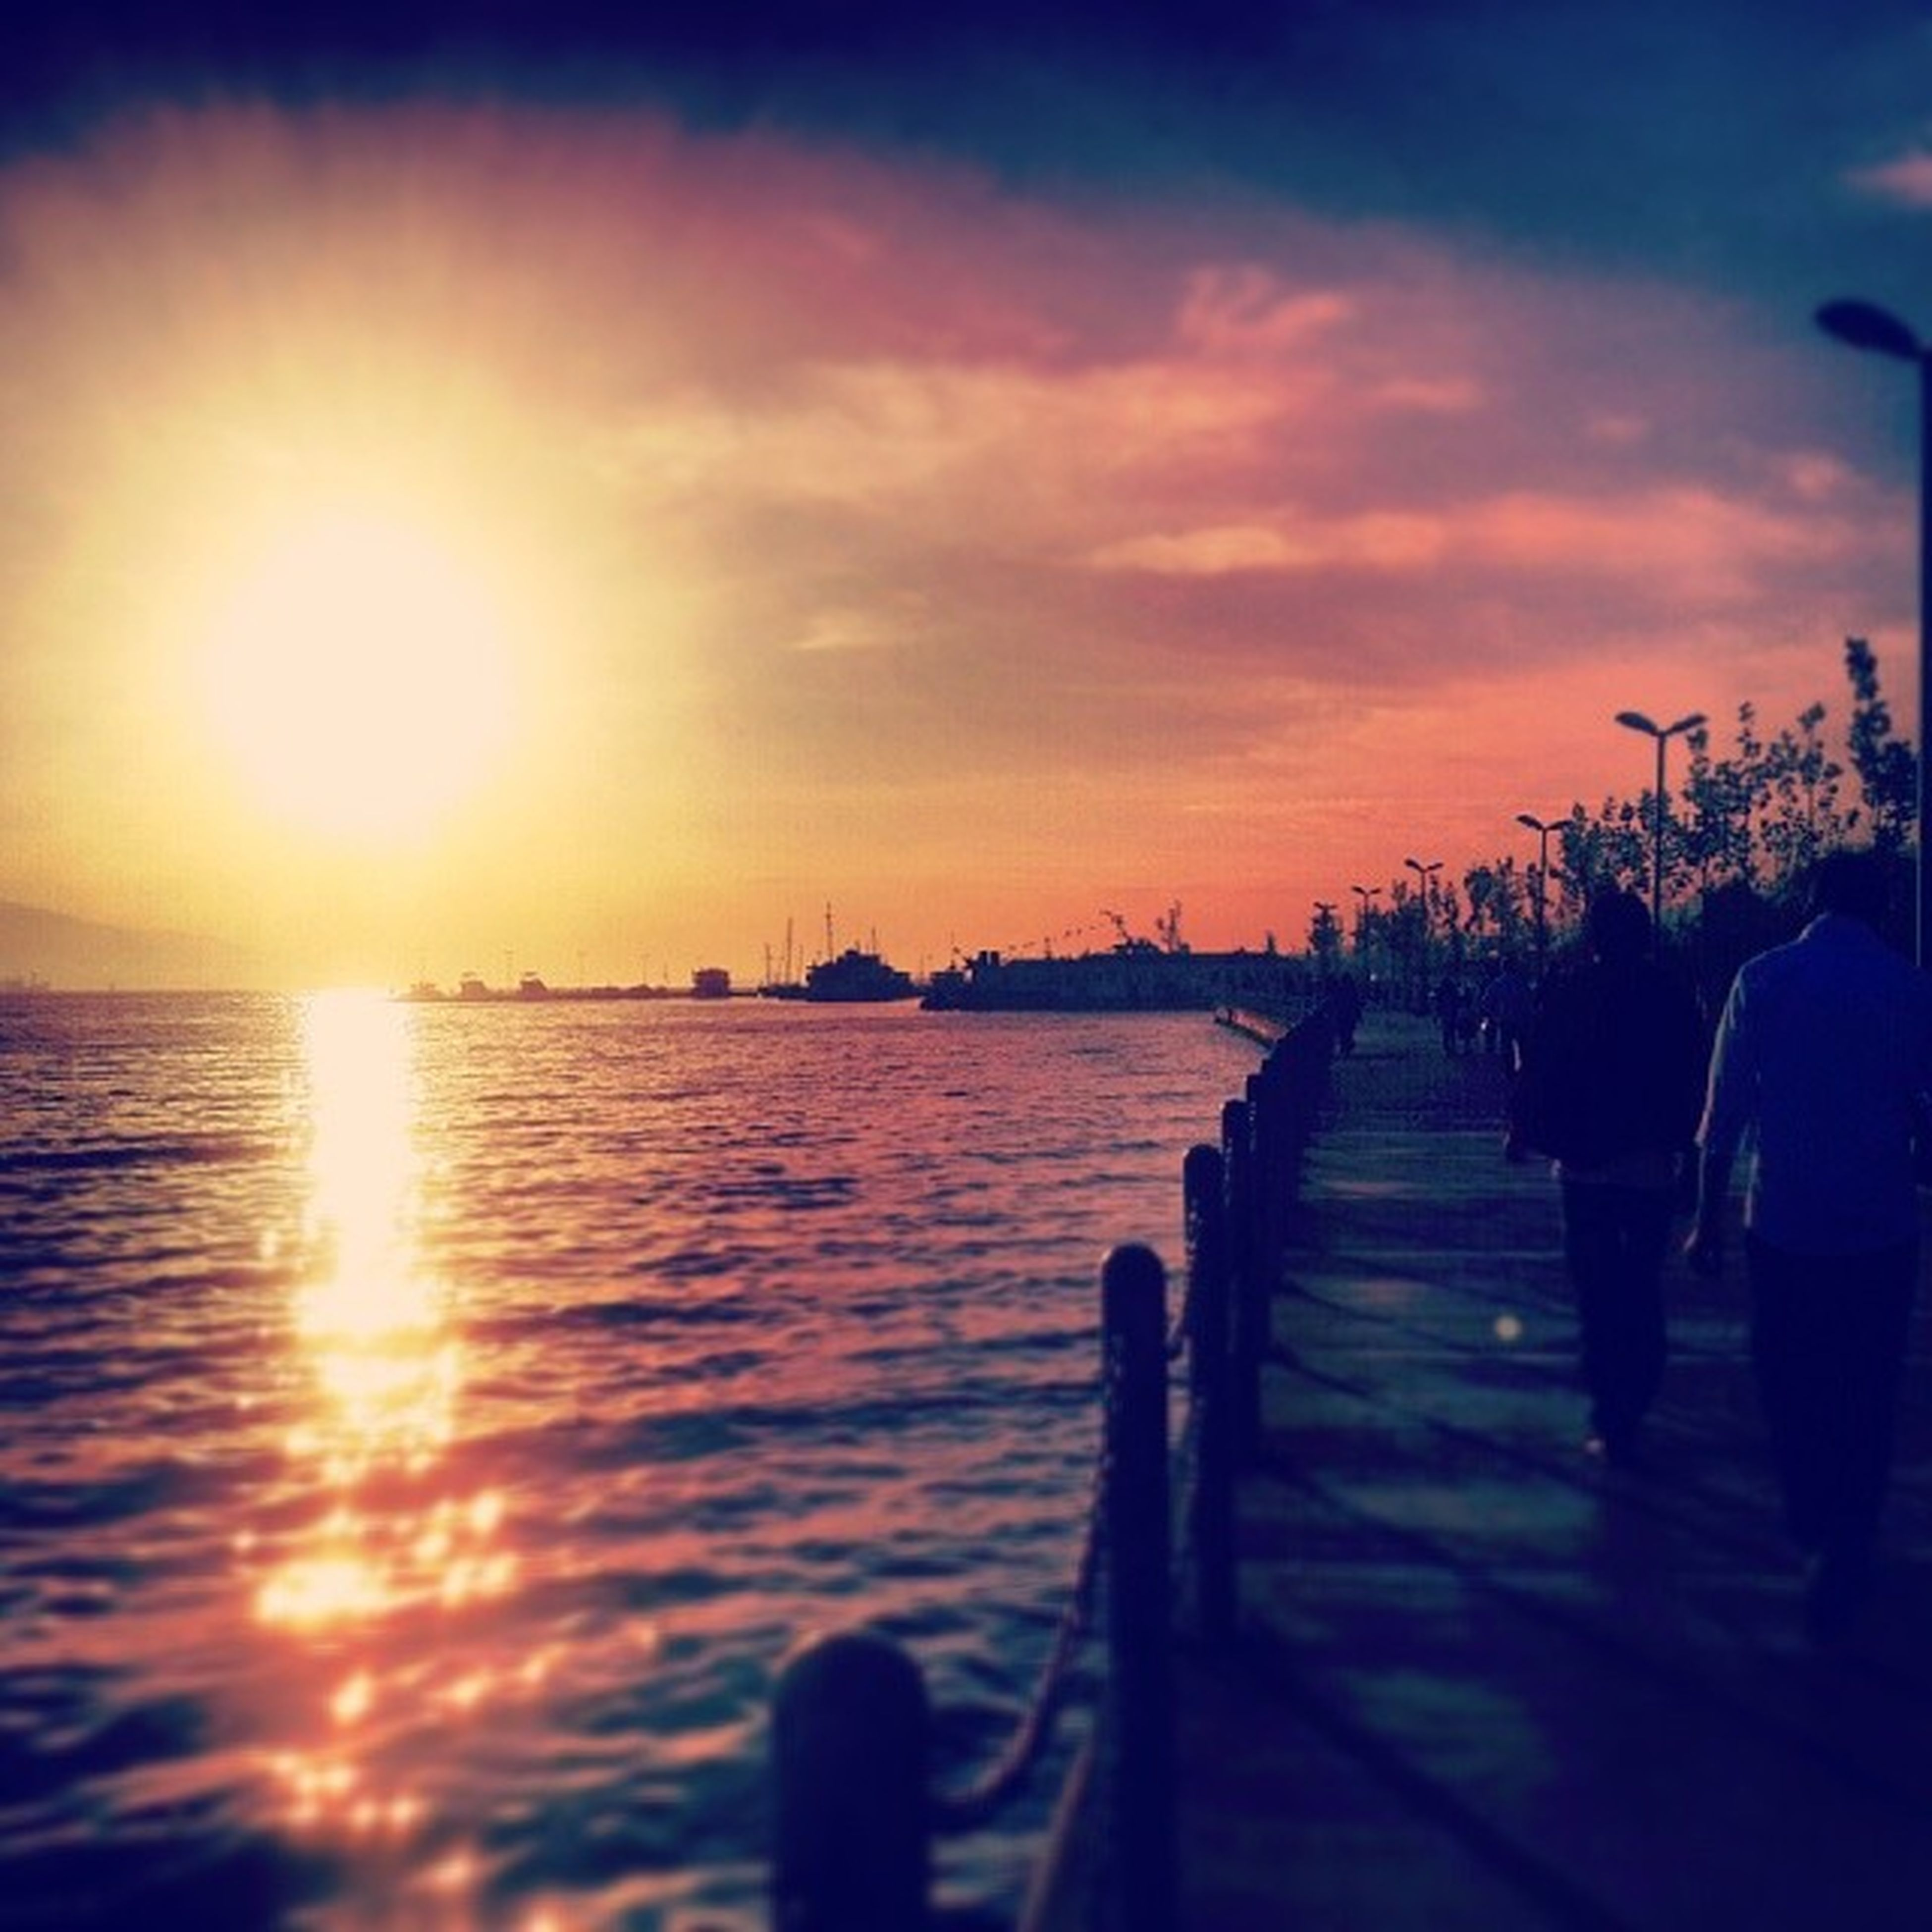 sunset, water, sun, sea, silhouette, sky, sunlight, sunbeam, reflection, pier, scenics, tranquil scene, lens flare, railing, tranquility, nature, beauty in nature, orange color, horizon over water, idyllic